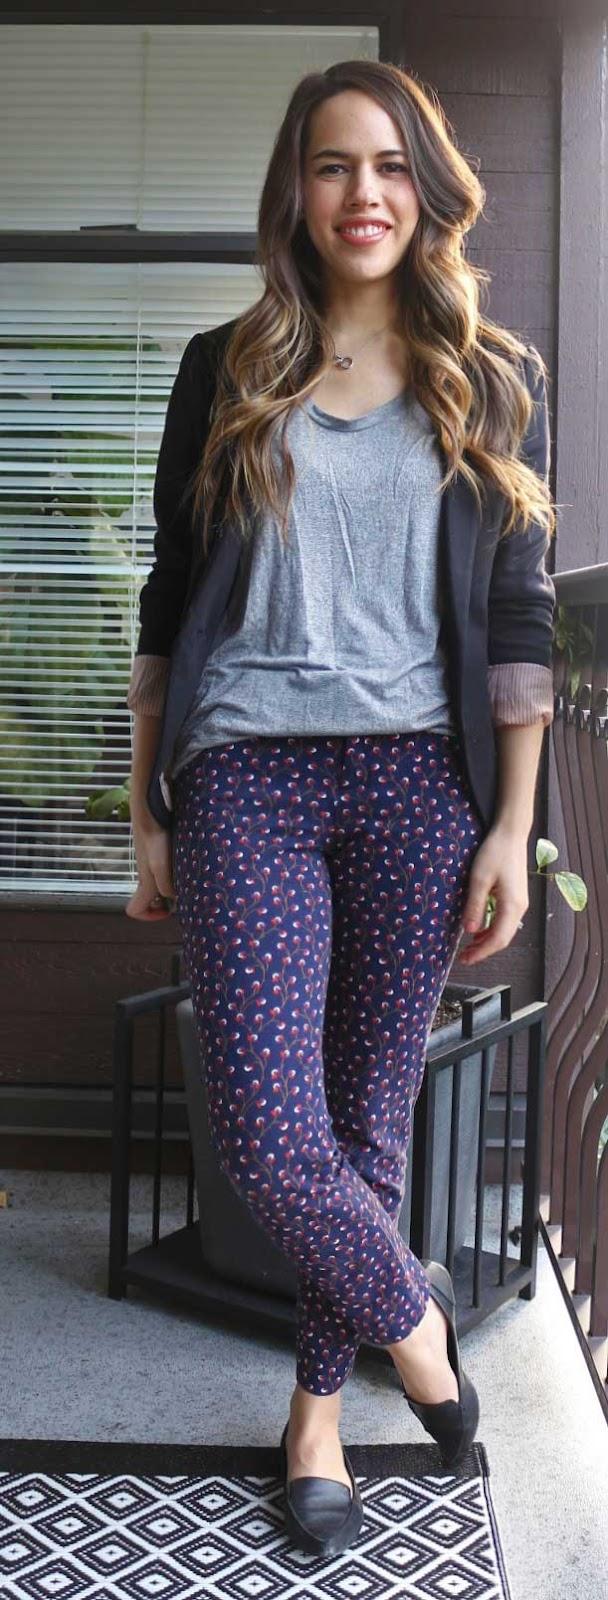 Jules in Flats - Printed Skinny Pants, Tshirt, Blazer